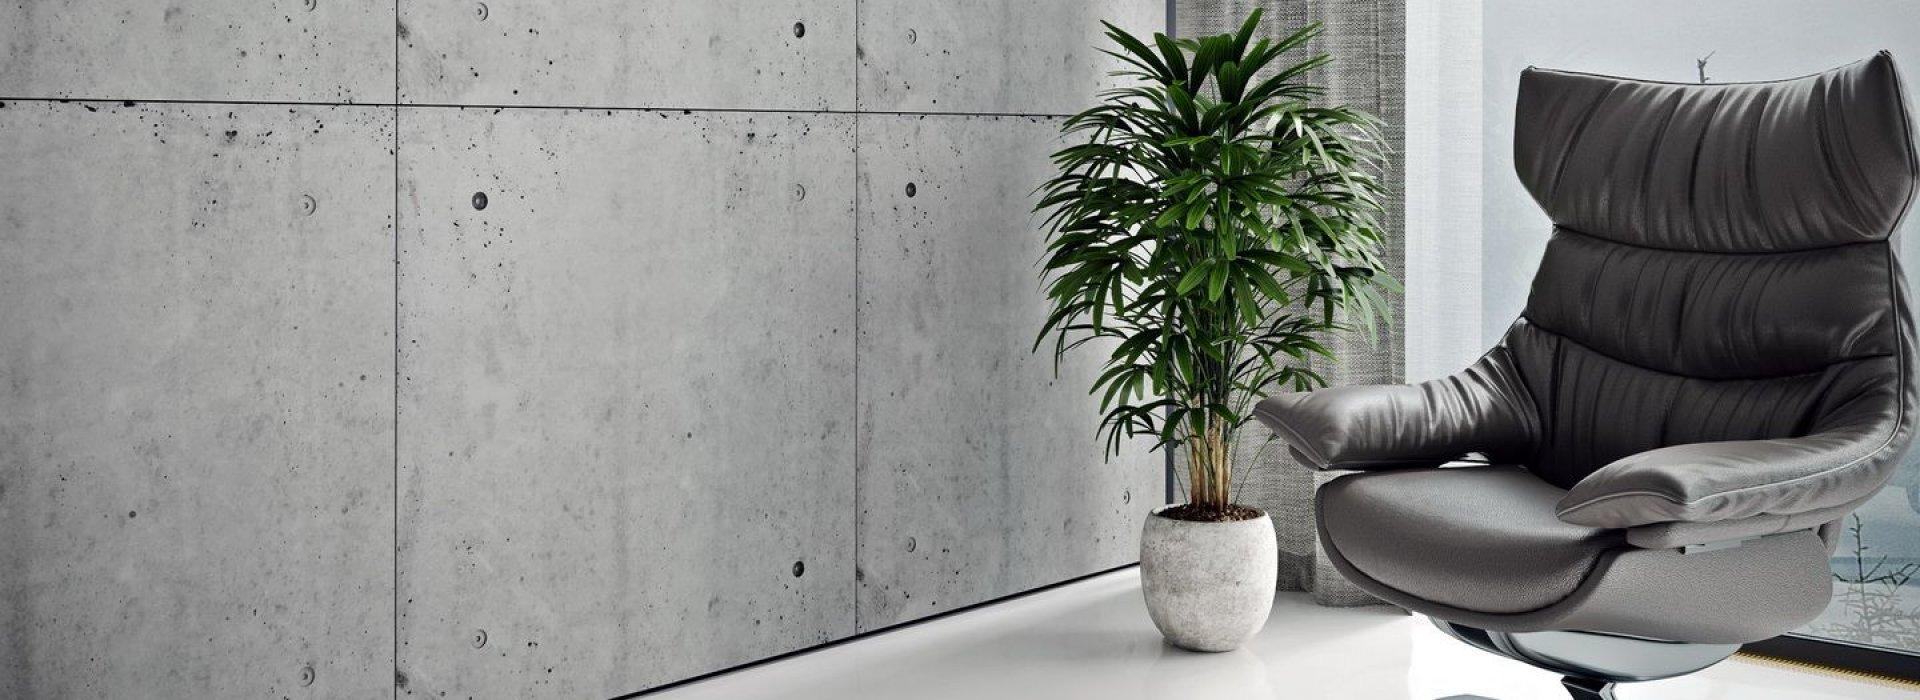 Loft панели из декоративного бетона